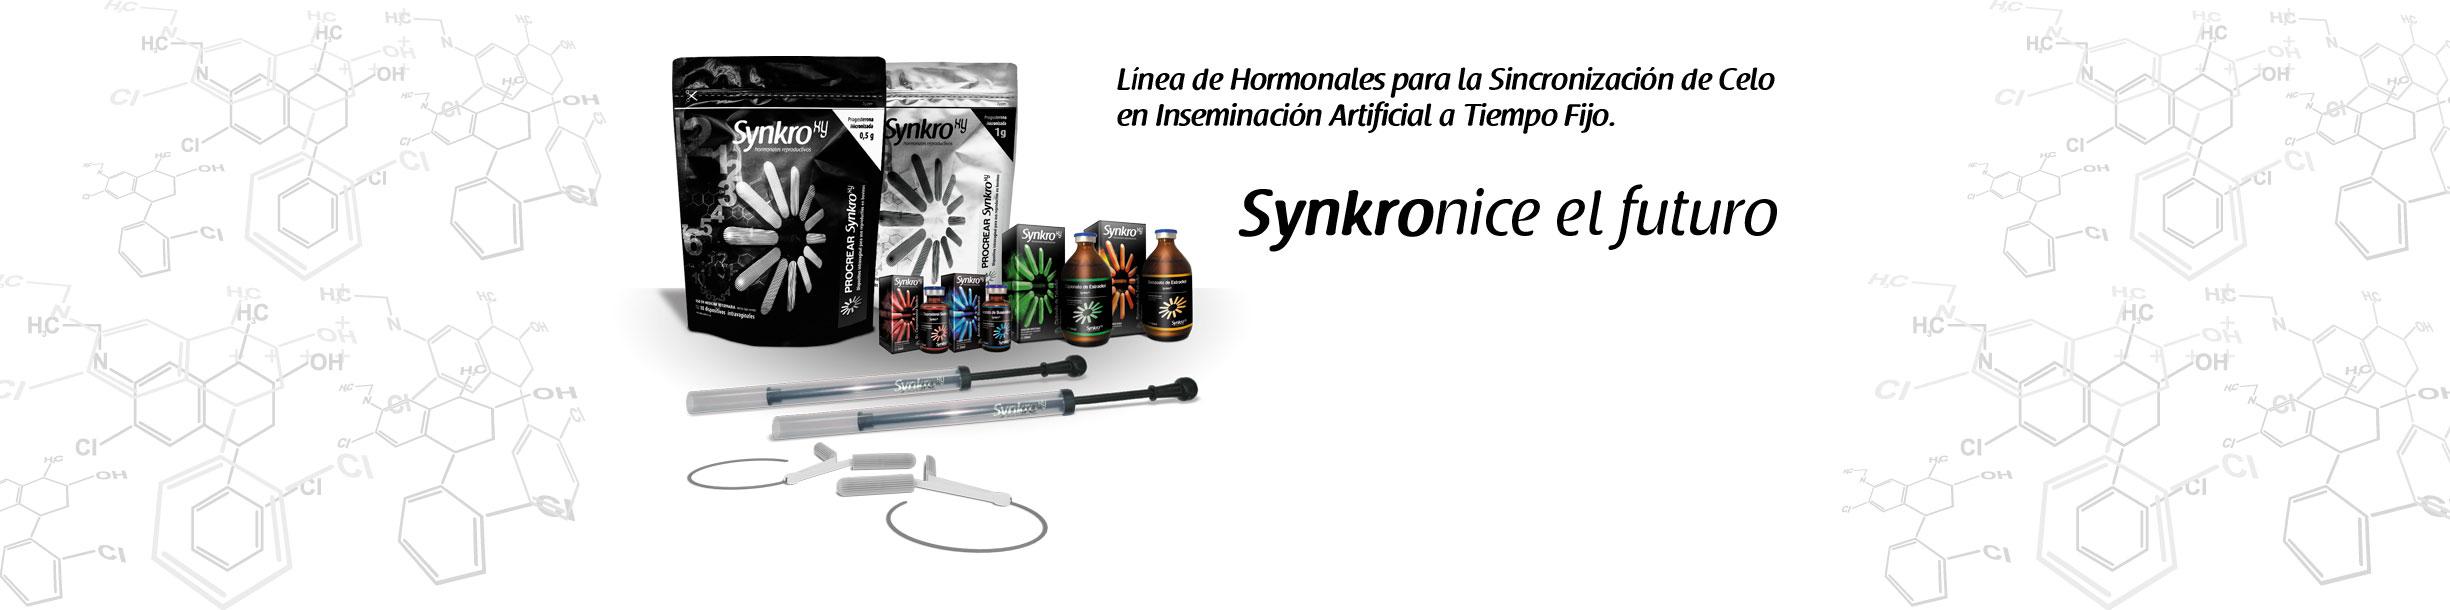 linea-completa-synkroxy